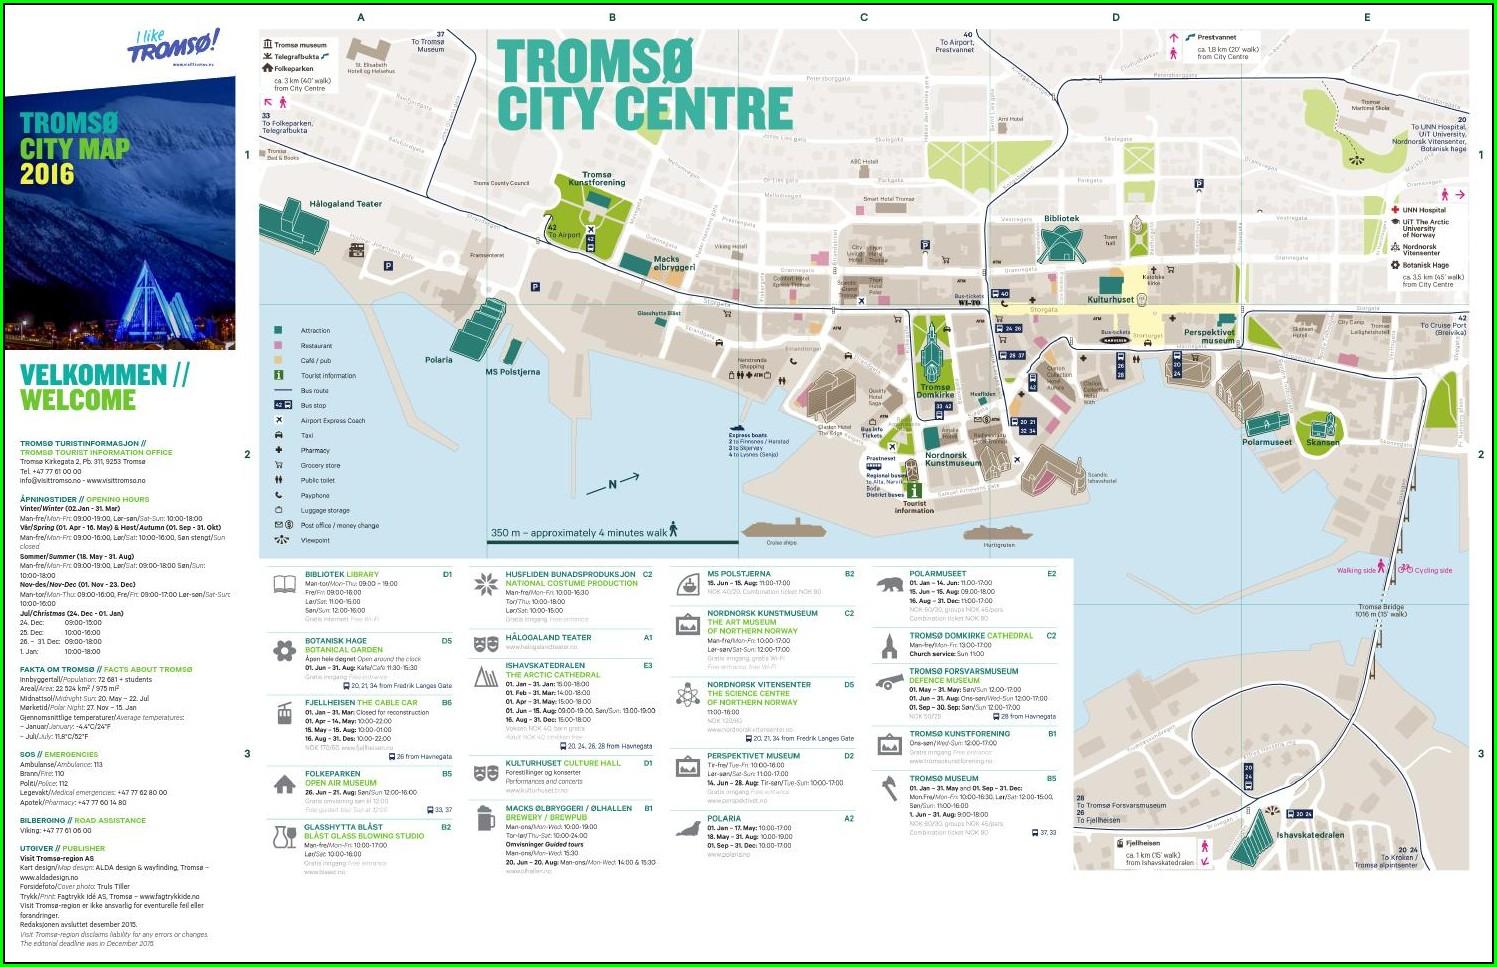 Tromso City Centre Map